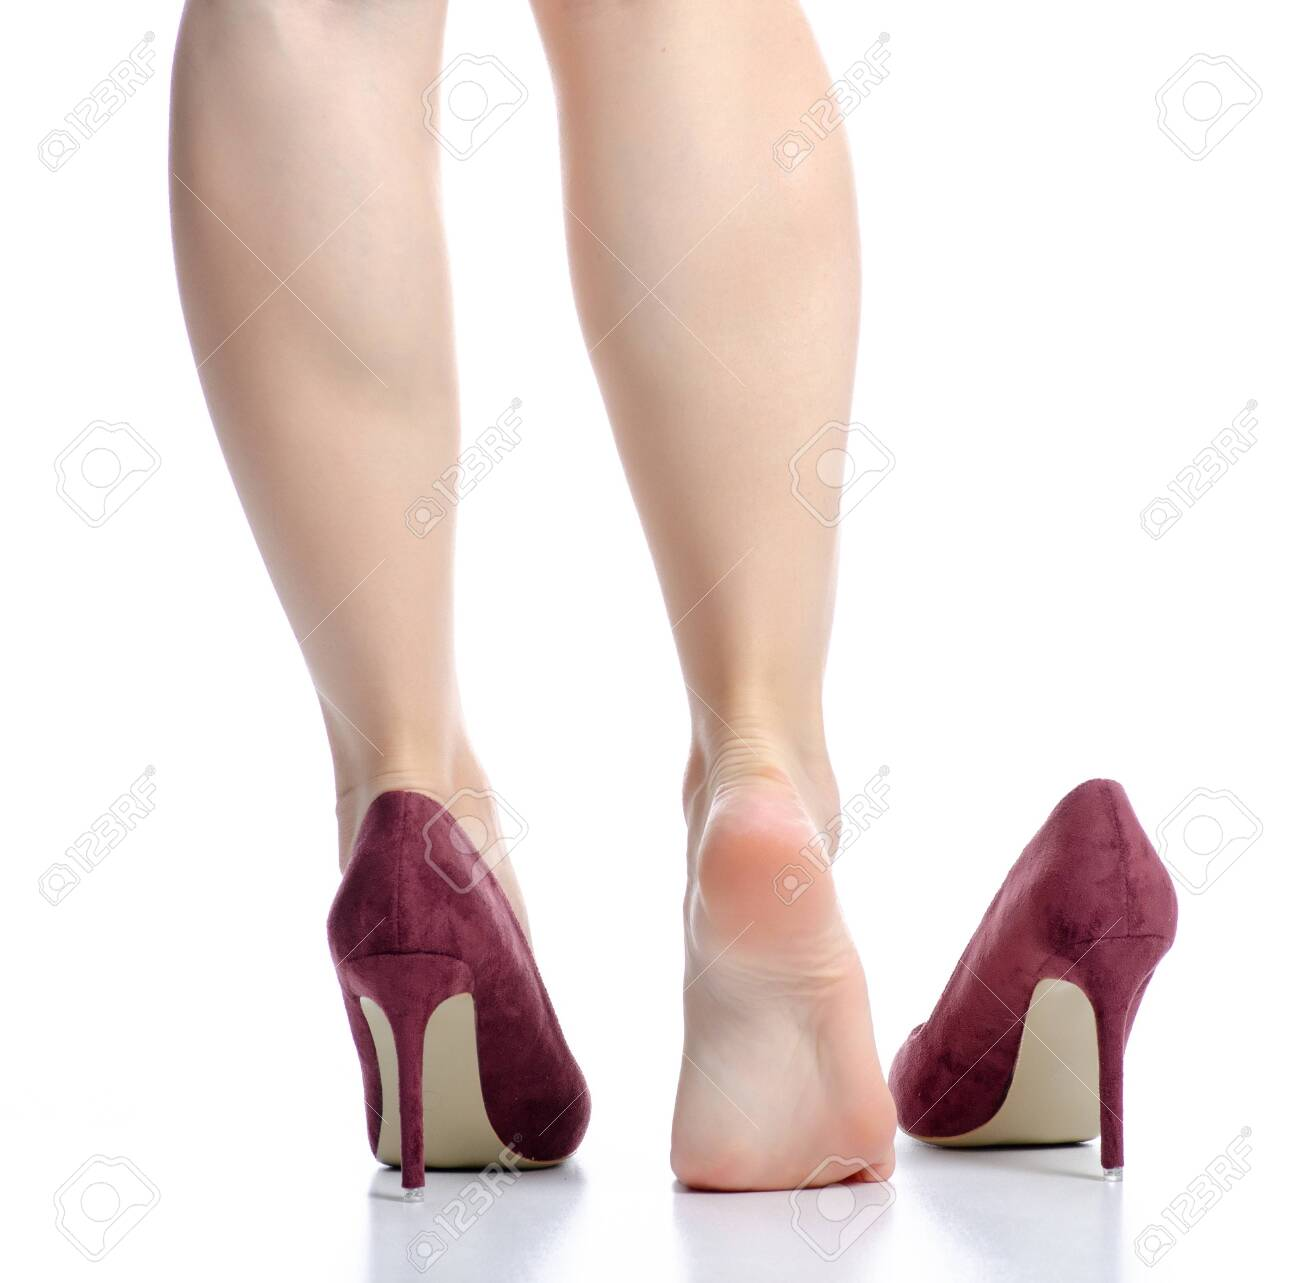 Female legs red high heels pain beauty - 143316600